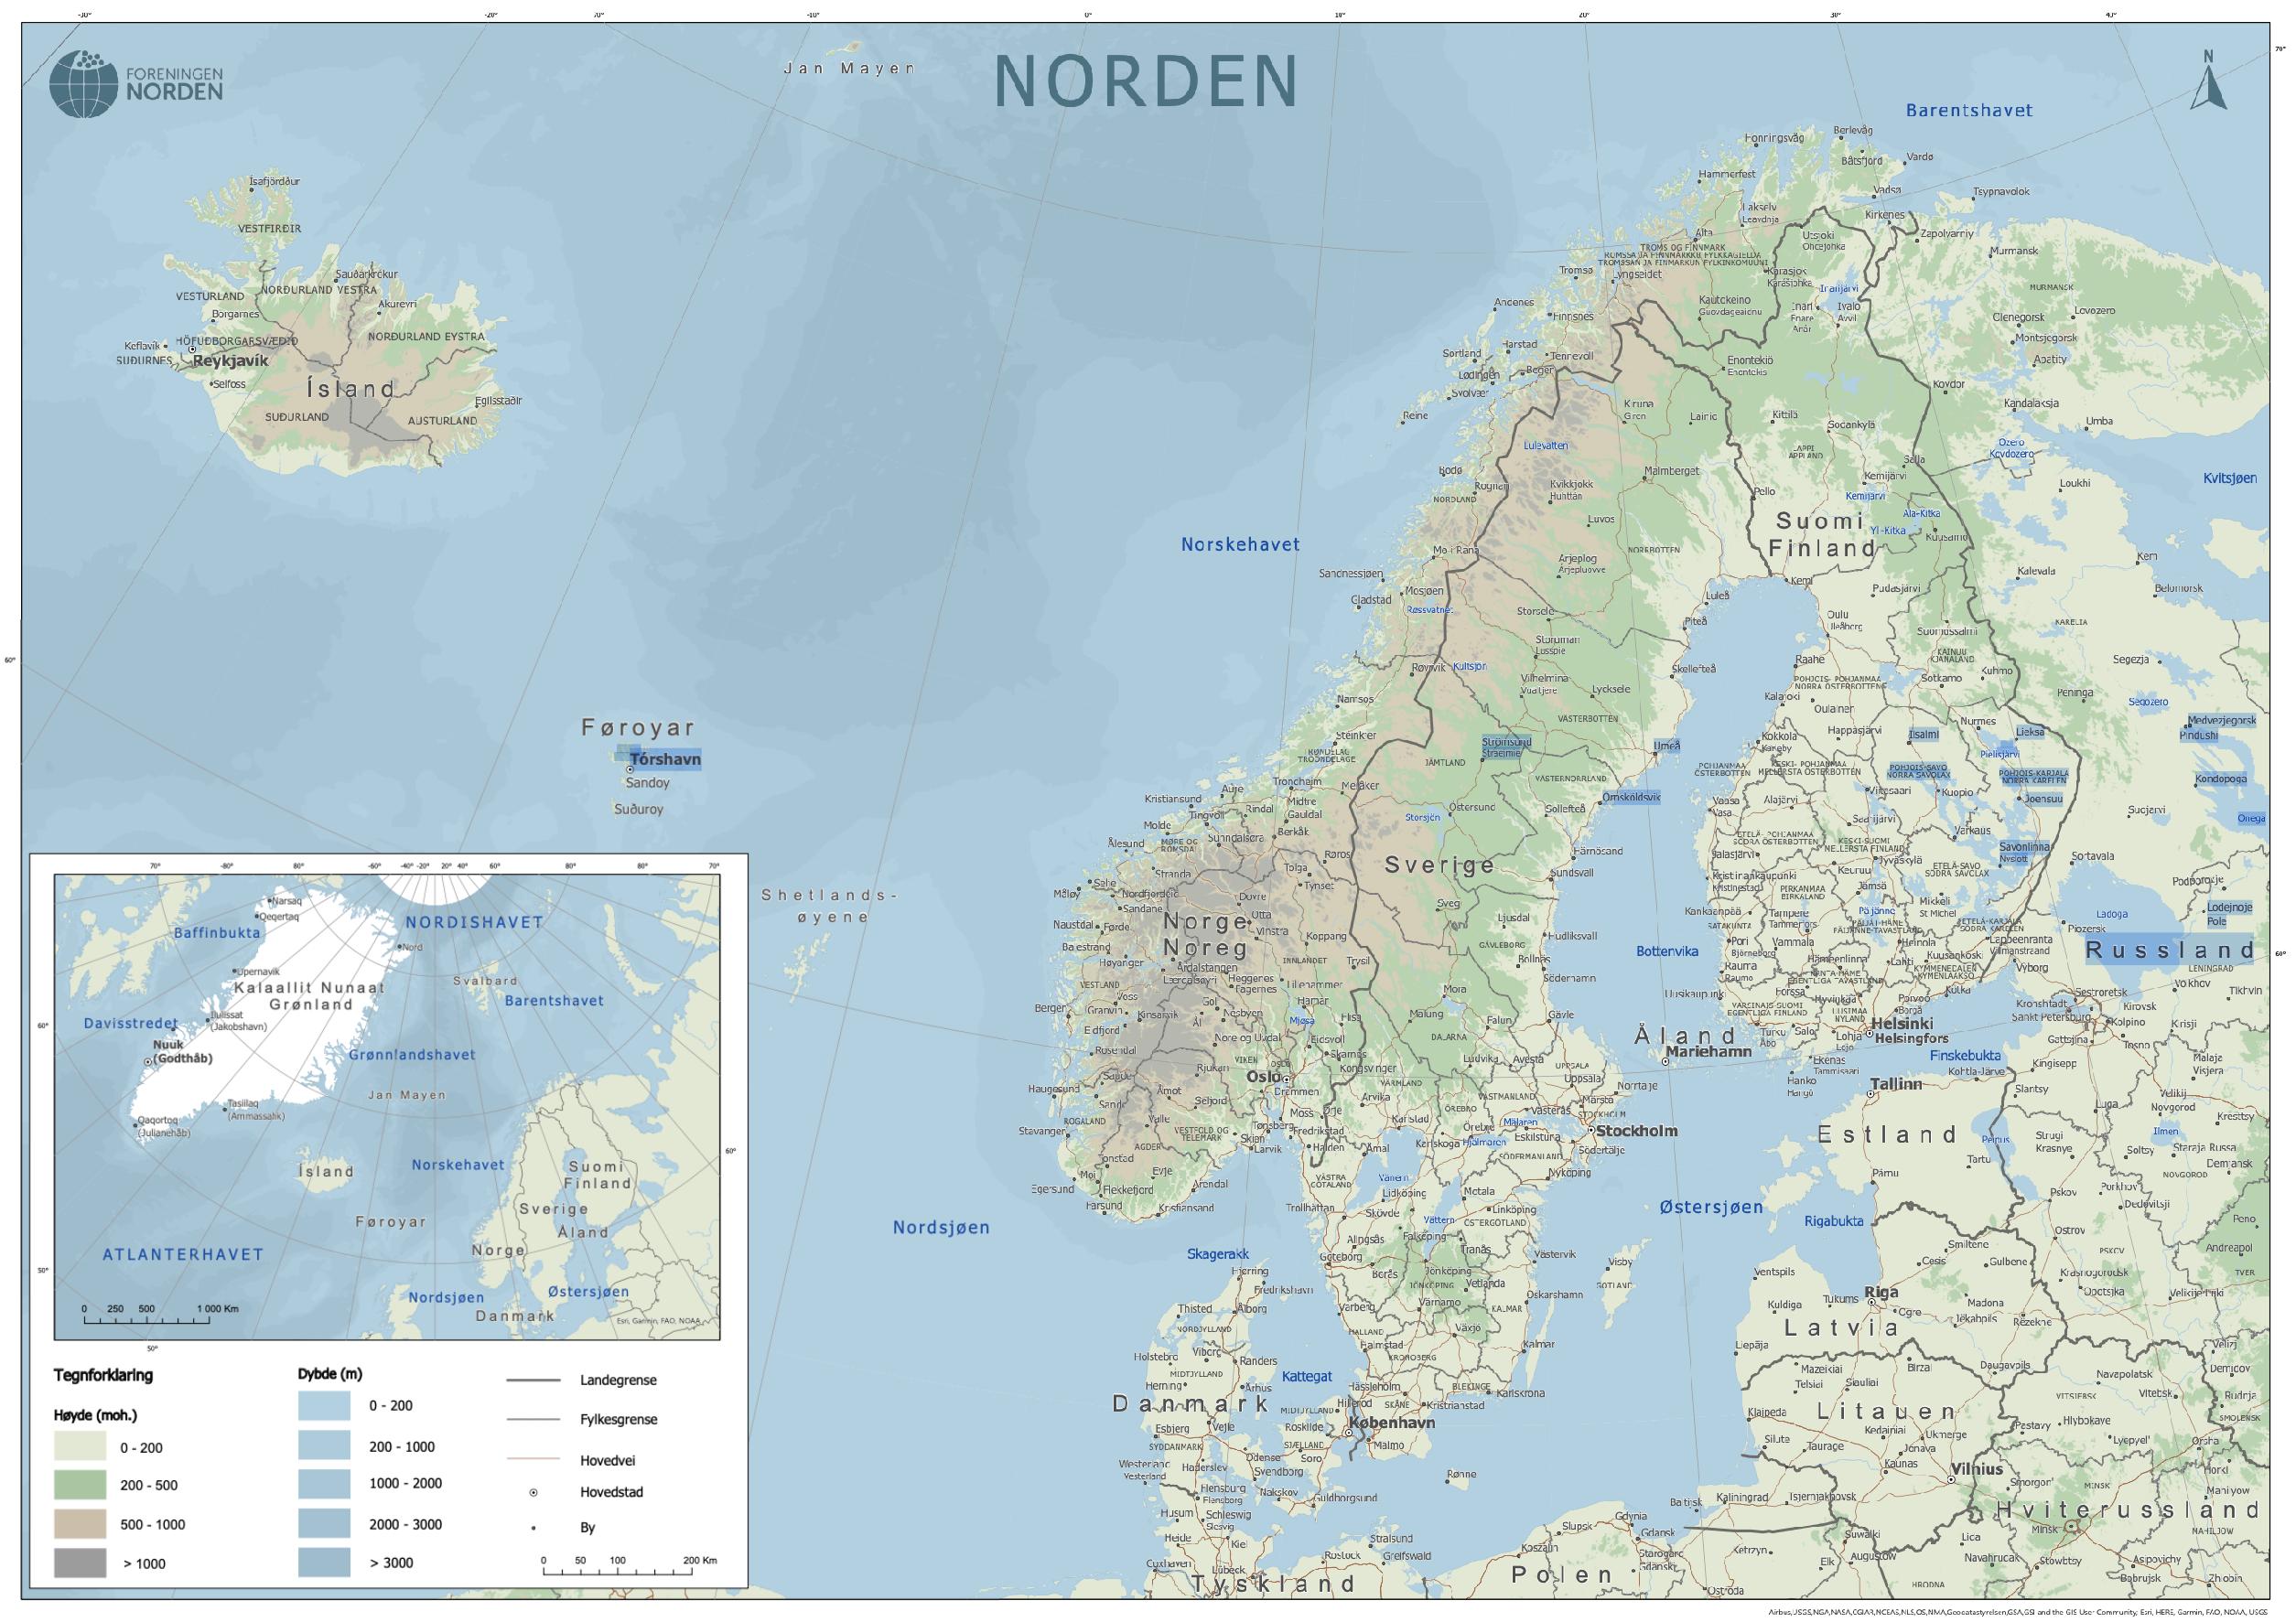 Nordenkart